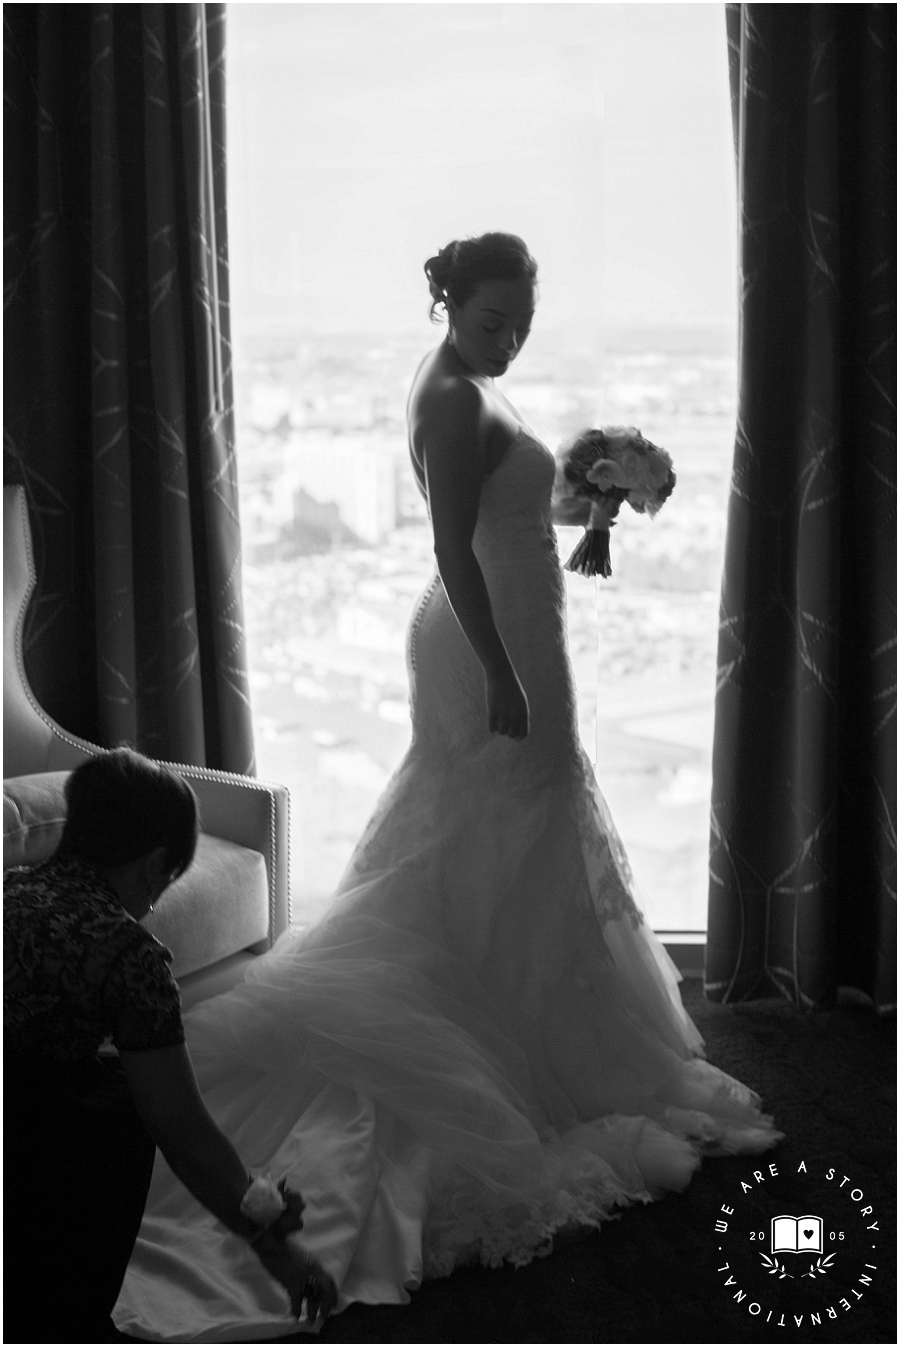 Four Seasons wedding photographer Las Vegas _ We Are A Story wedding photographer_2471.jpg